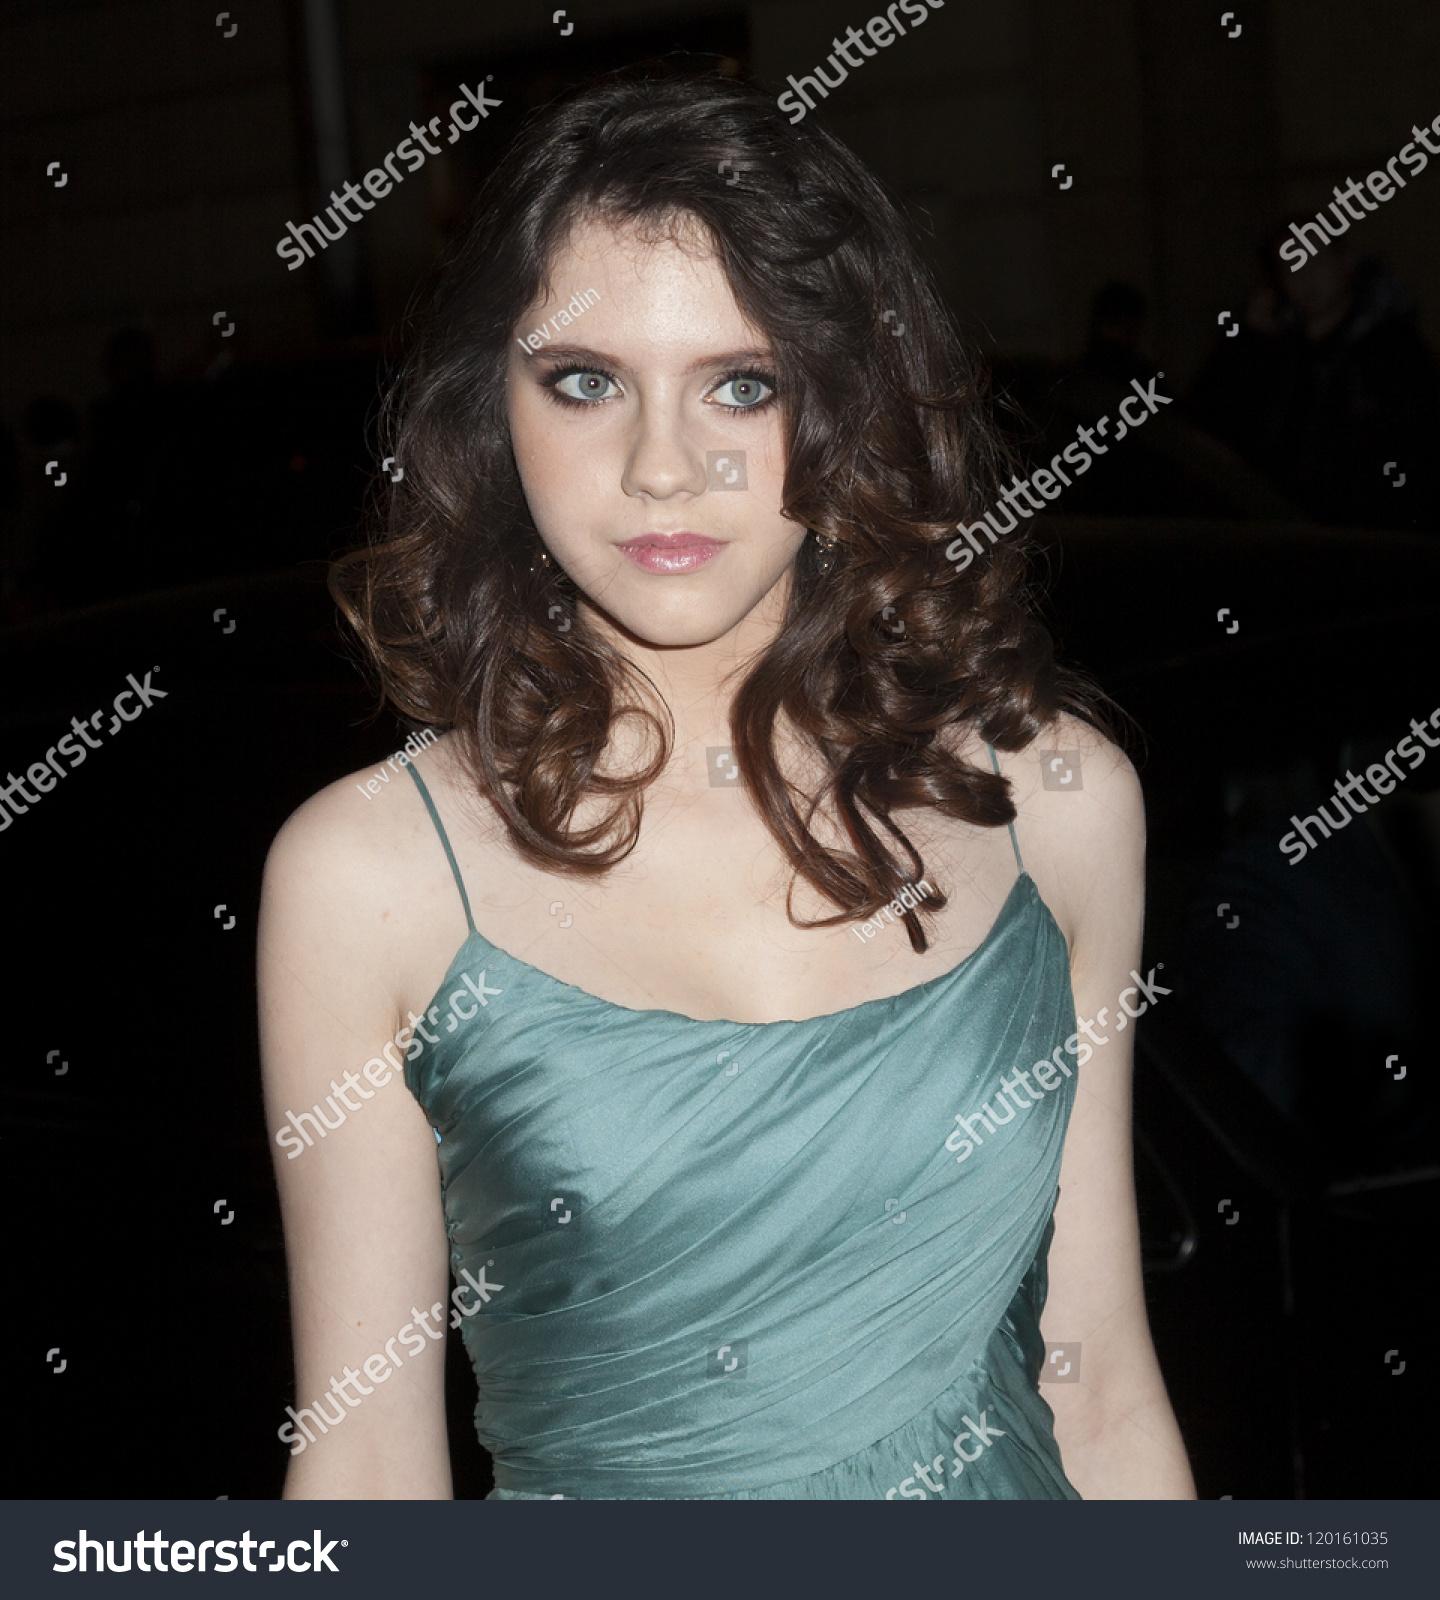 Leaked Carine Felizardo nudes (66 photo), Tits, Leaked, Twitter, braless 2006